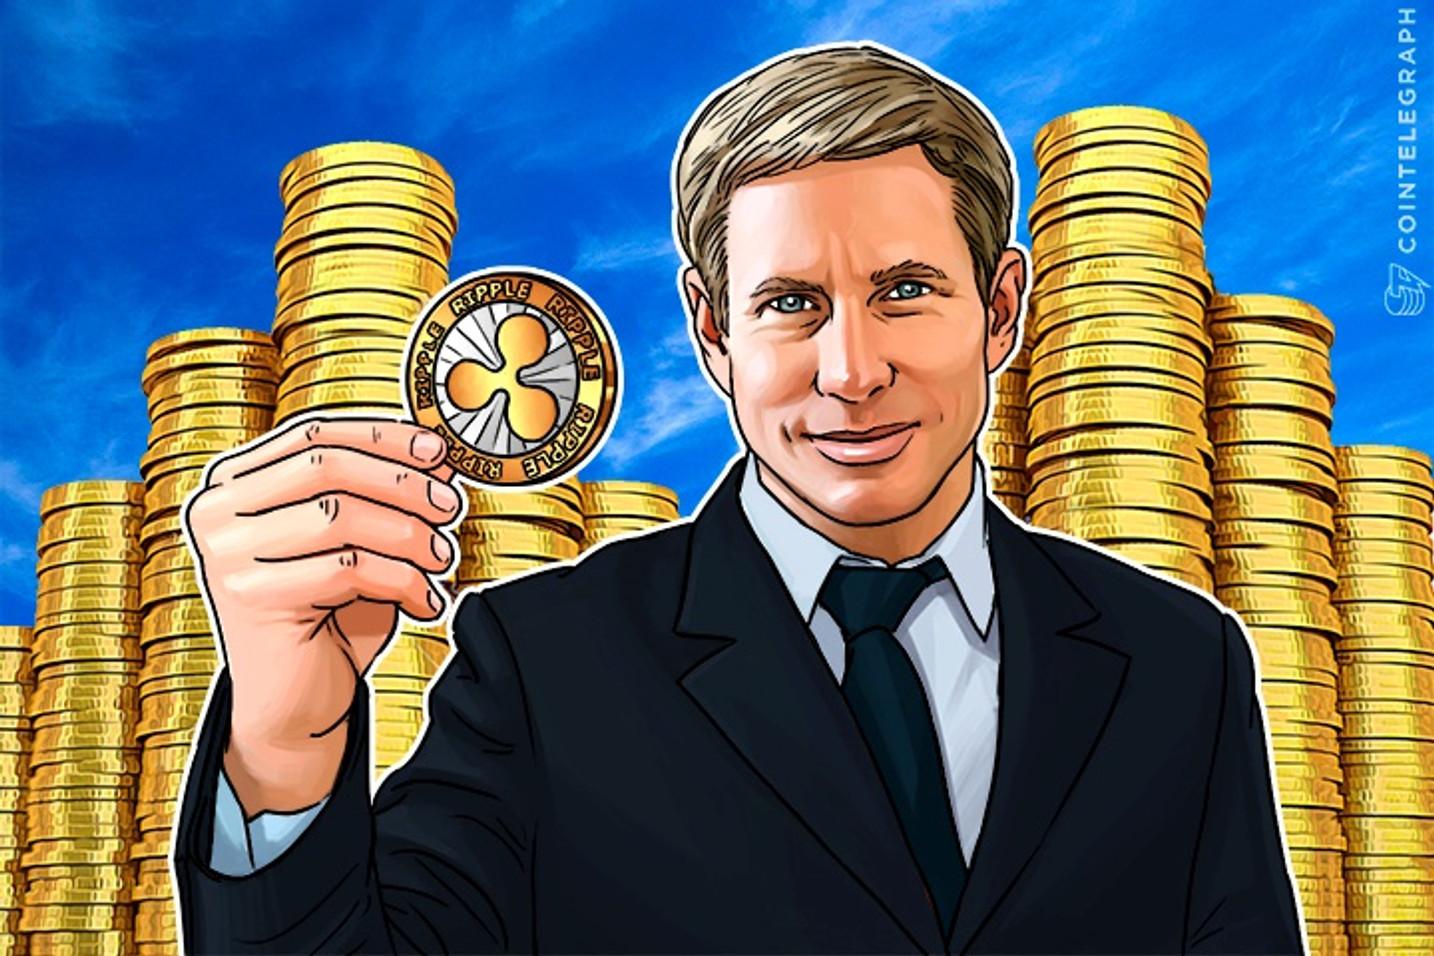 US Blockchain Company Ripple Raises $55 Mln, Investors Include Major Banks